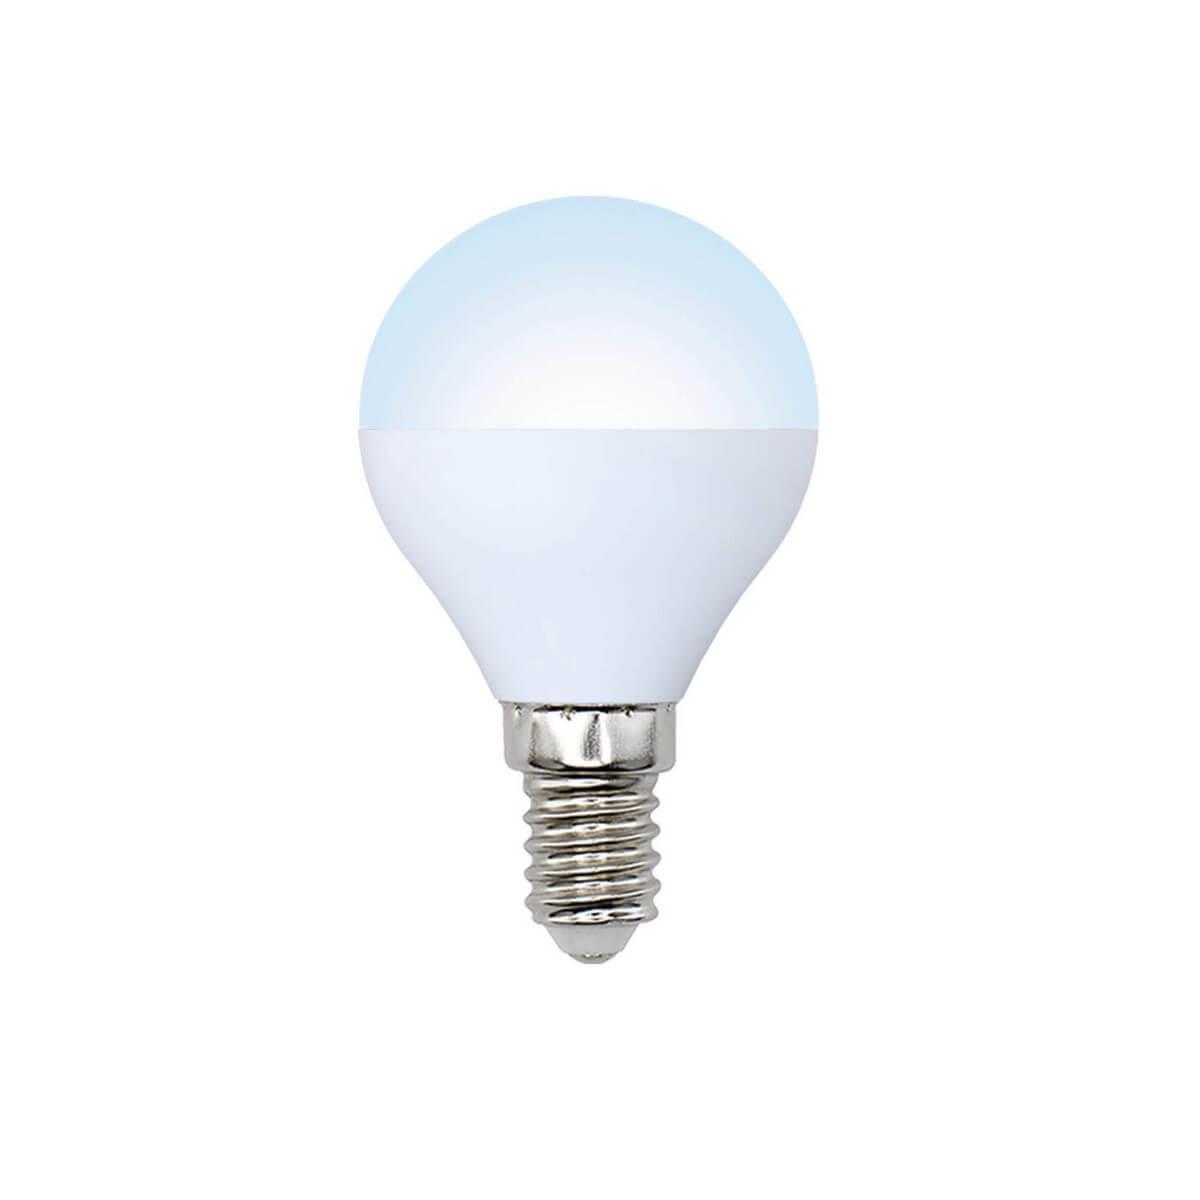 цена на Лампа светодиодная (10215) E14 6W 4500K матовая LED-G45-6W/NW/E14/FR/O